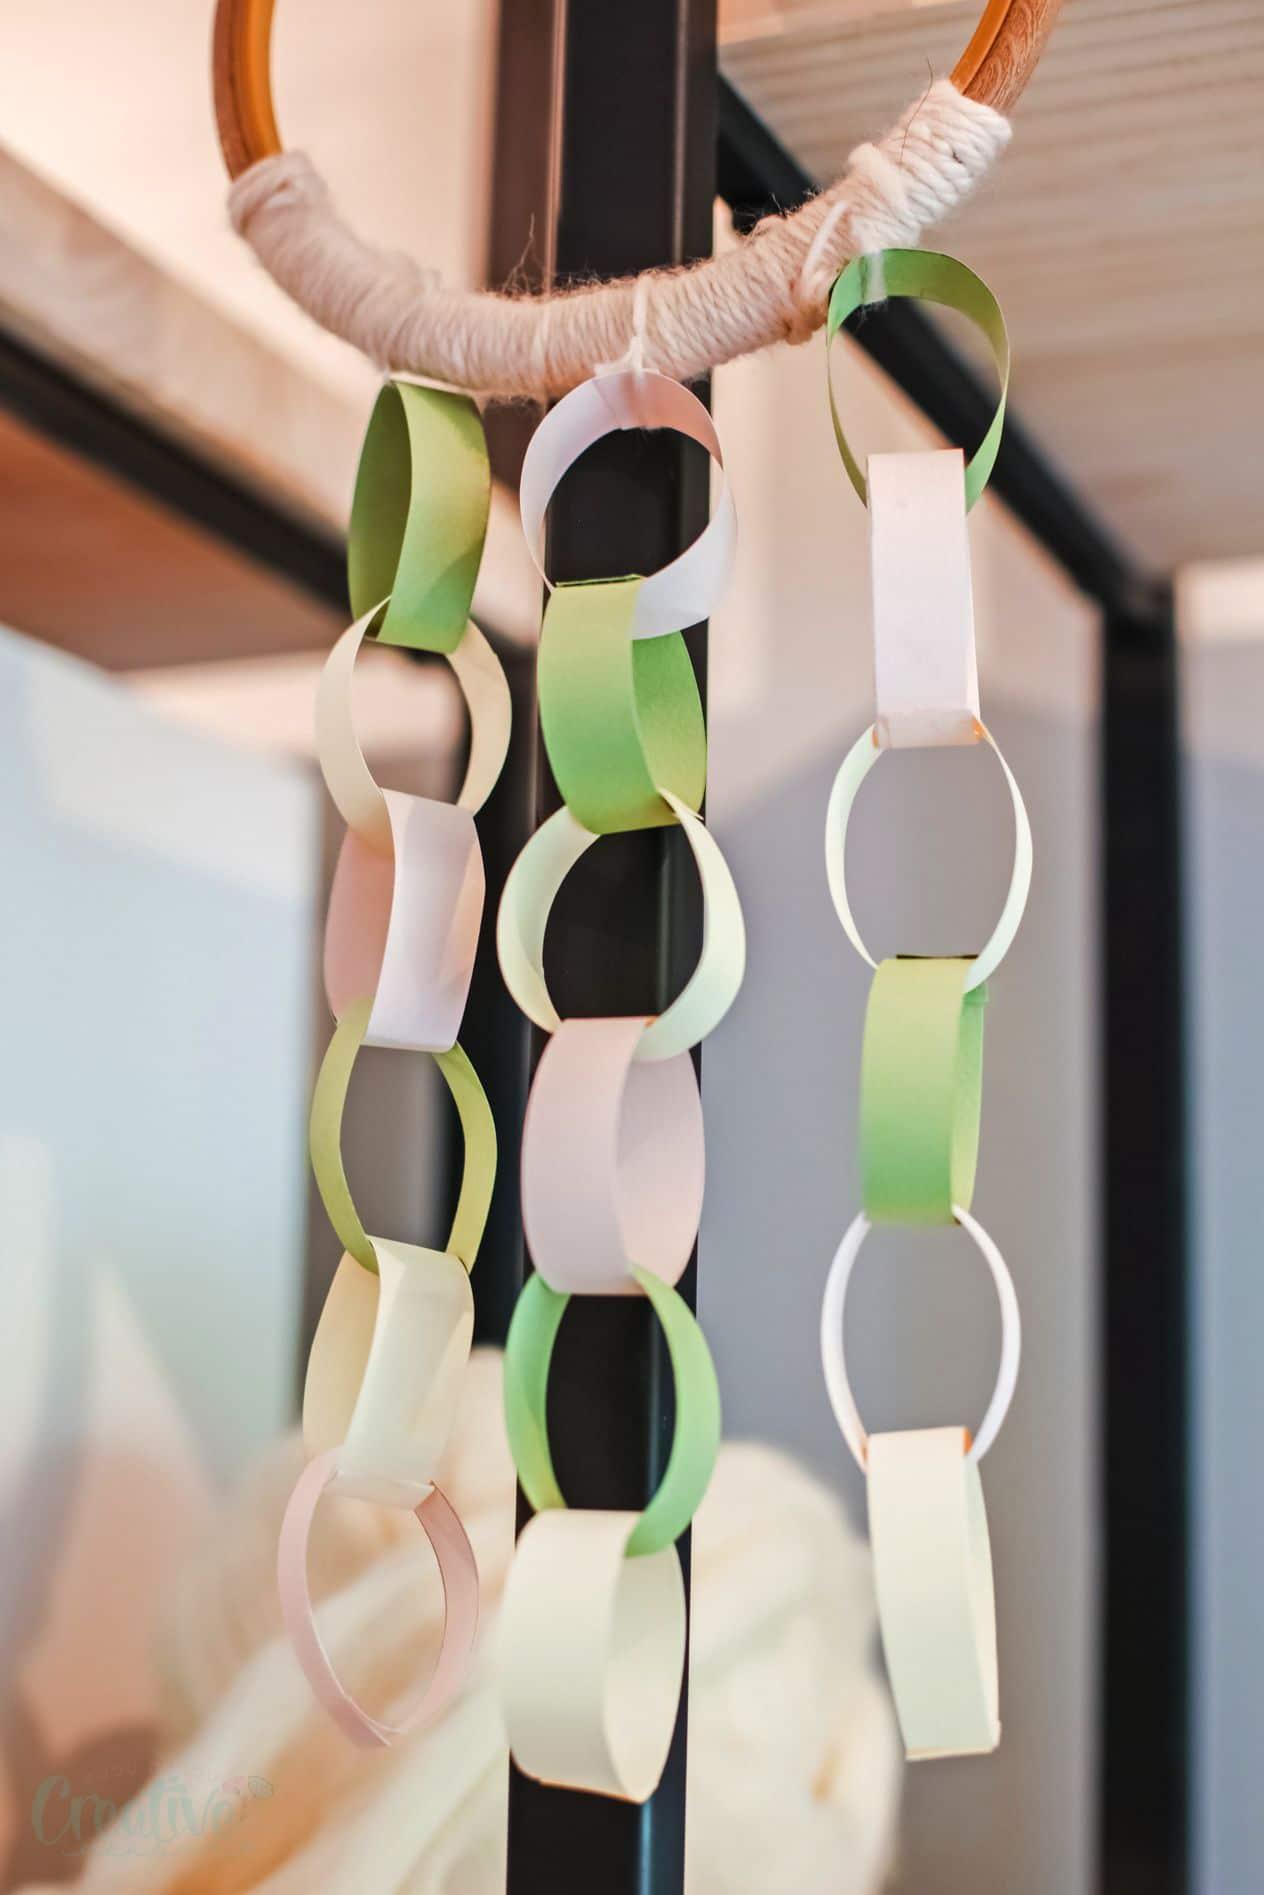 Paper chain craft